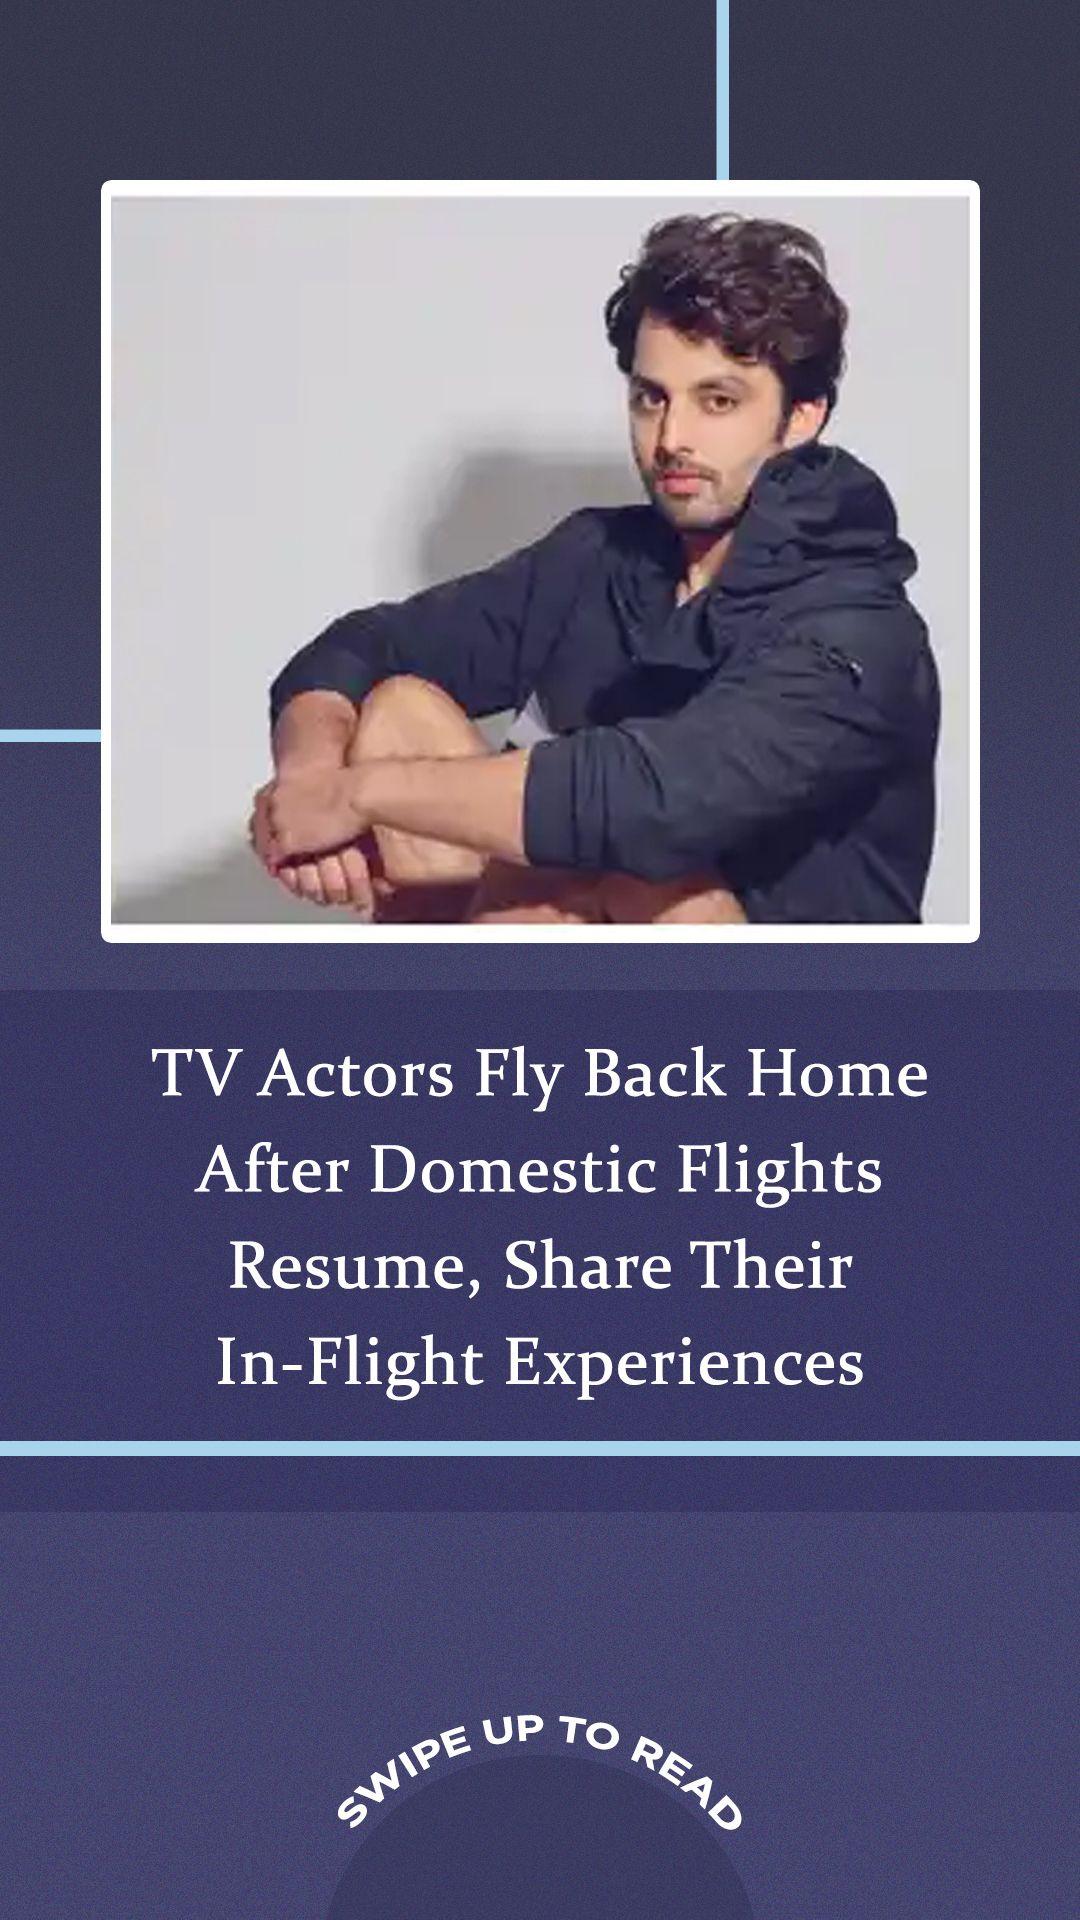 TV Actors Fly Back Home After Domestic Flights Resume